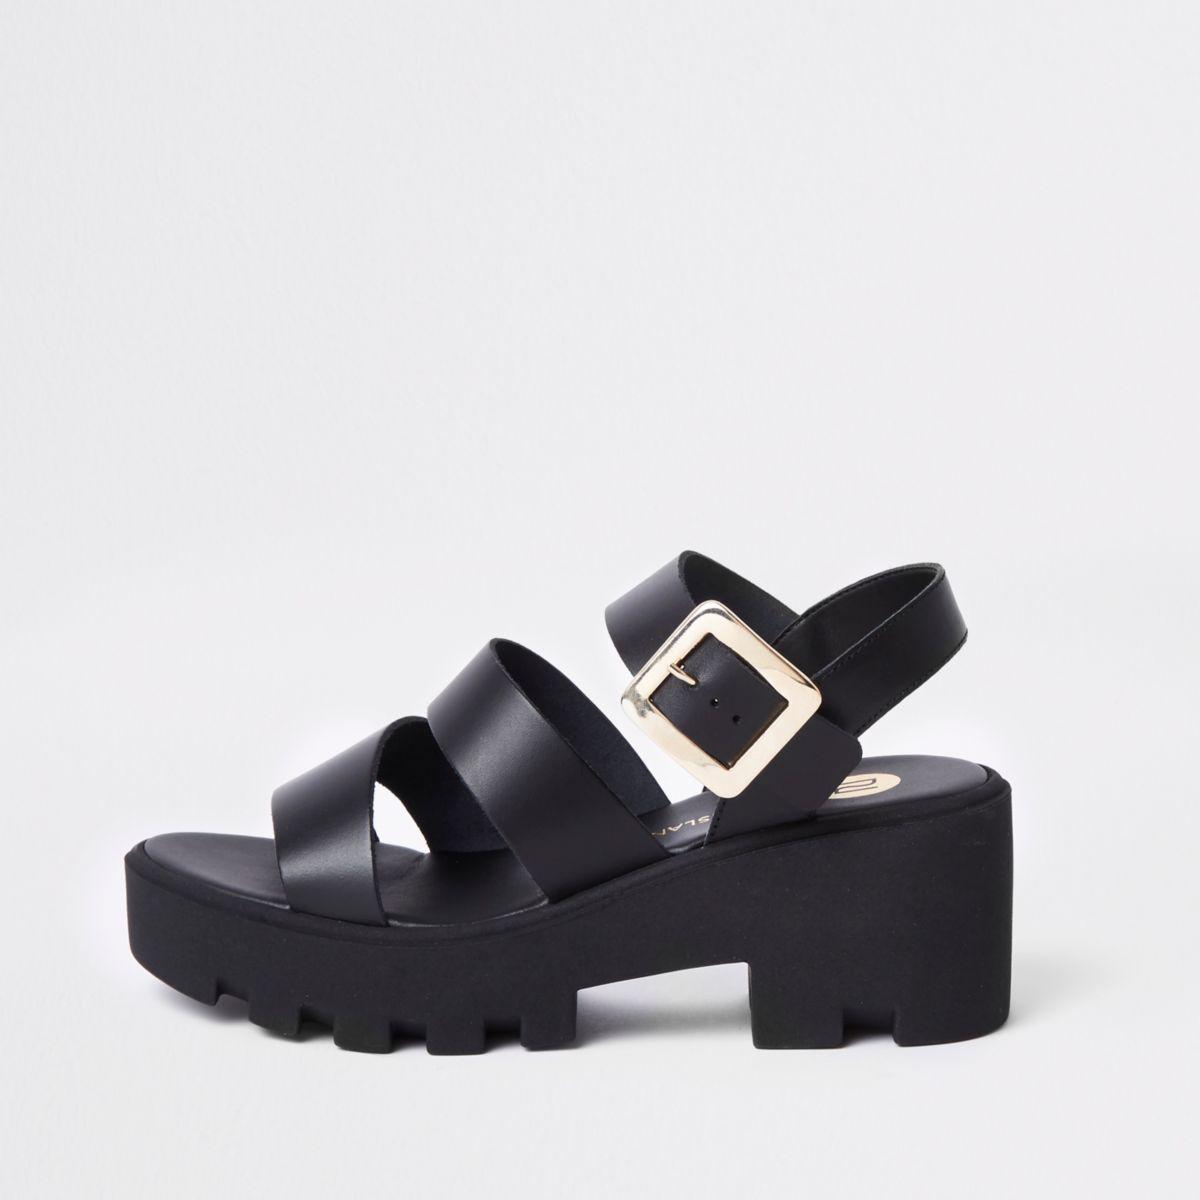 Zwarte stevige sandalen